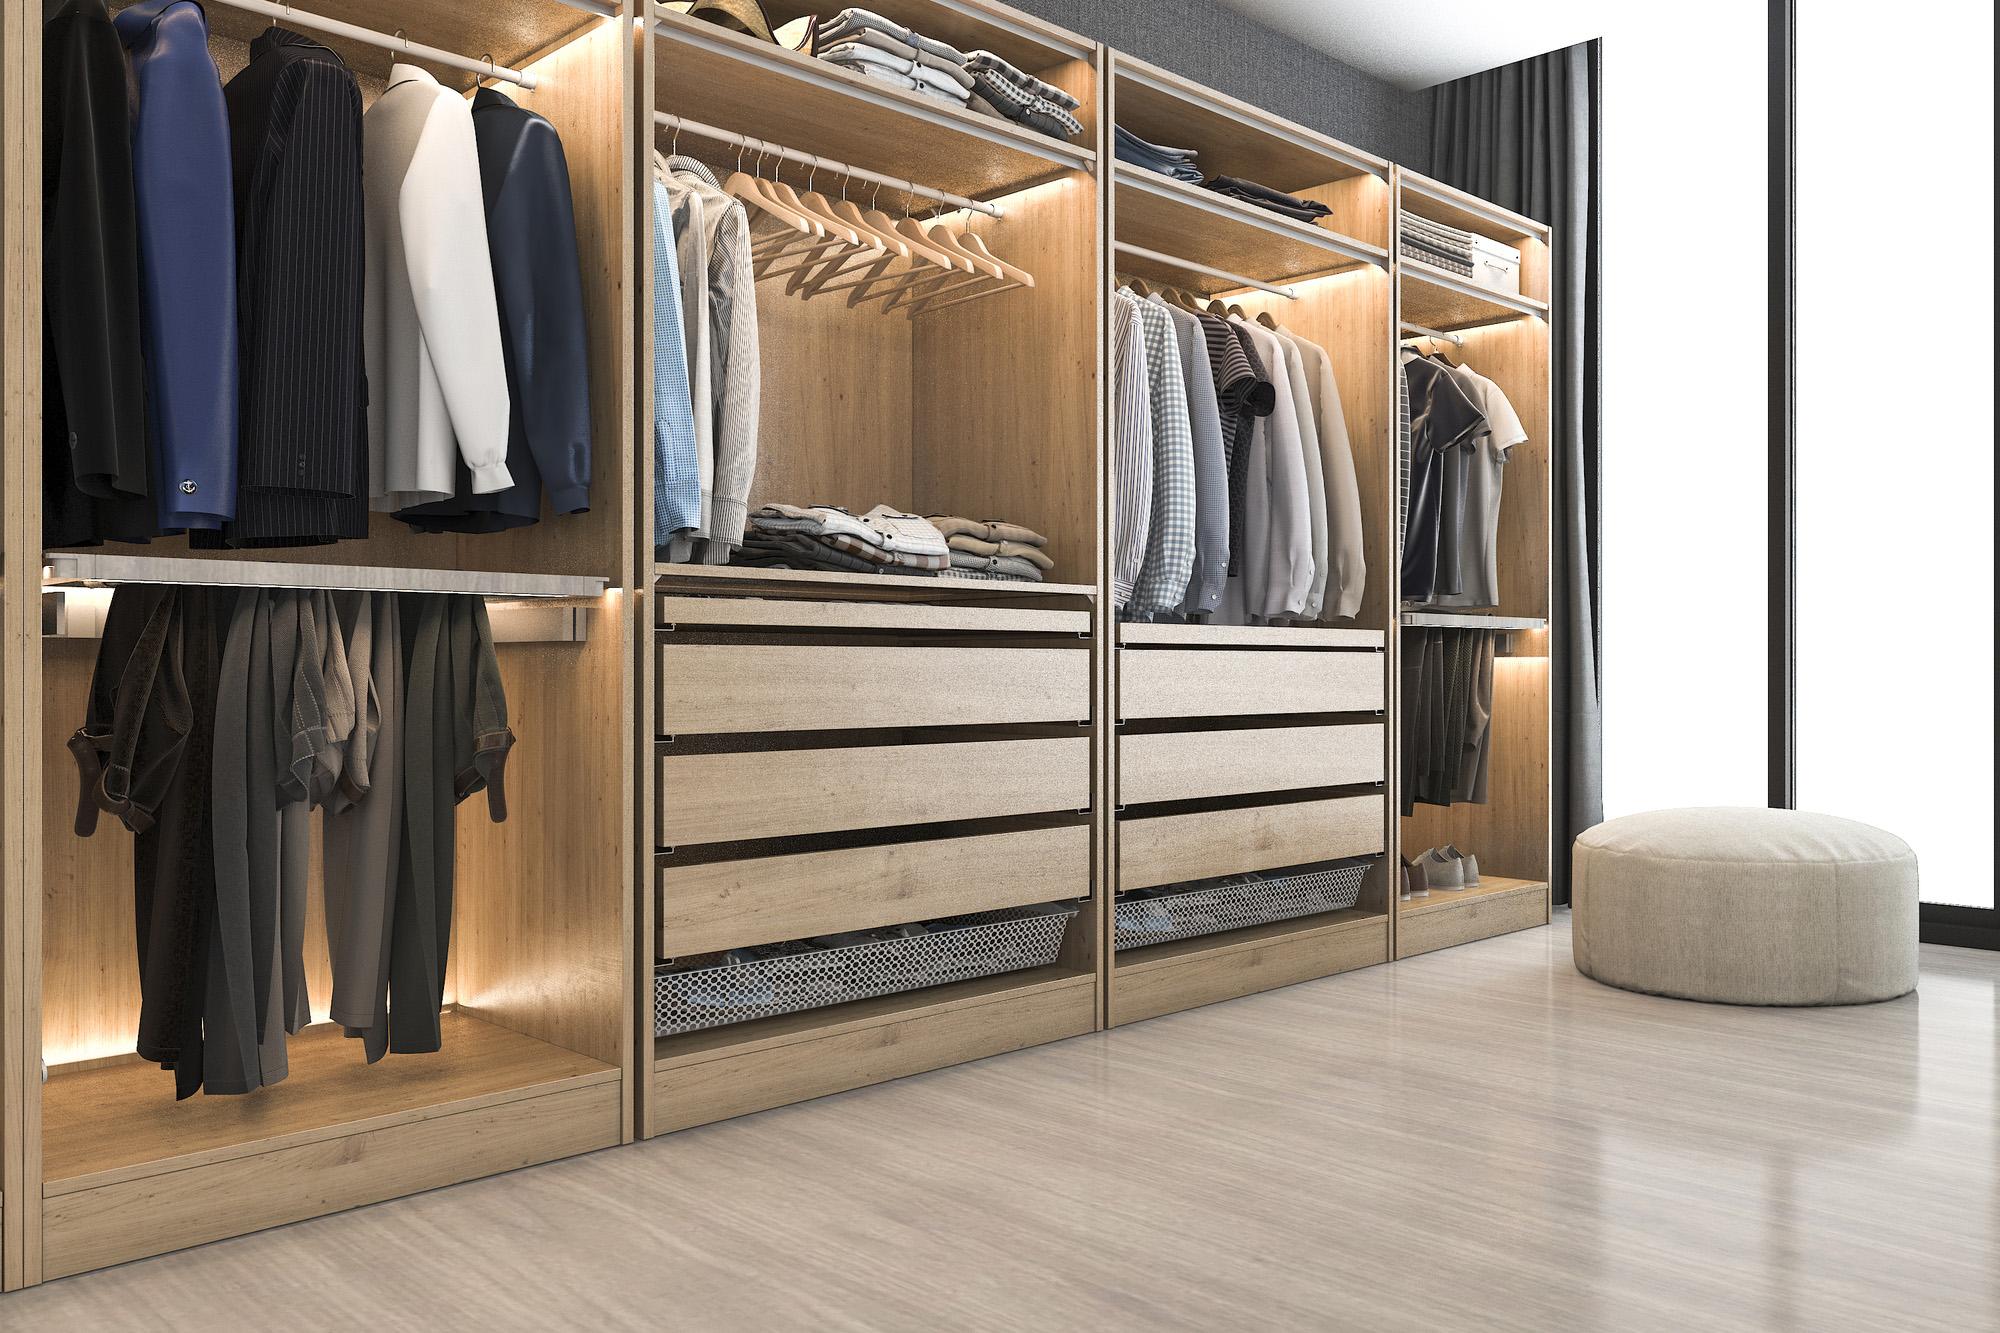 fitted wardrobe, open wardrobe system, wardrobe internal drawers